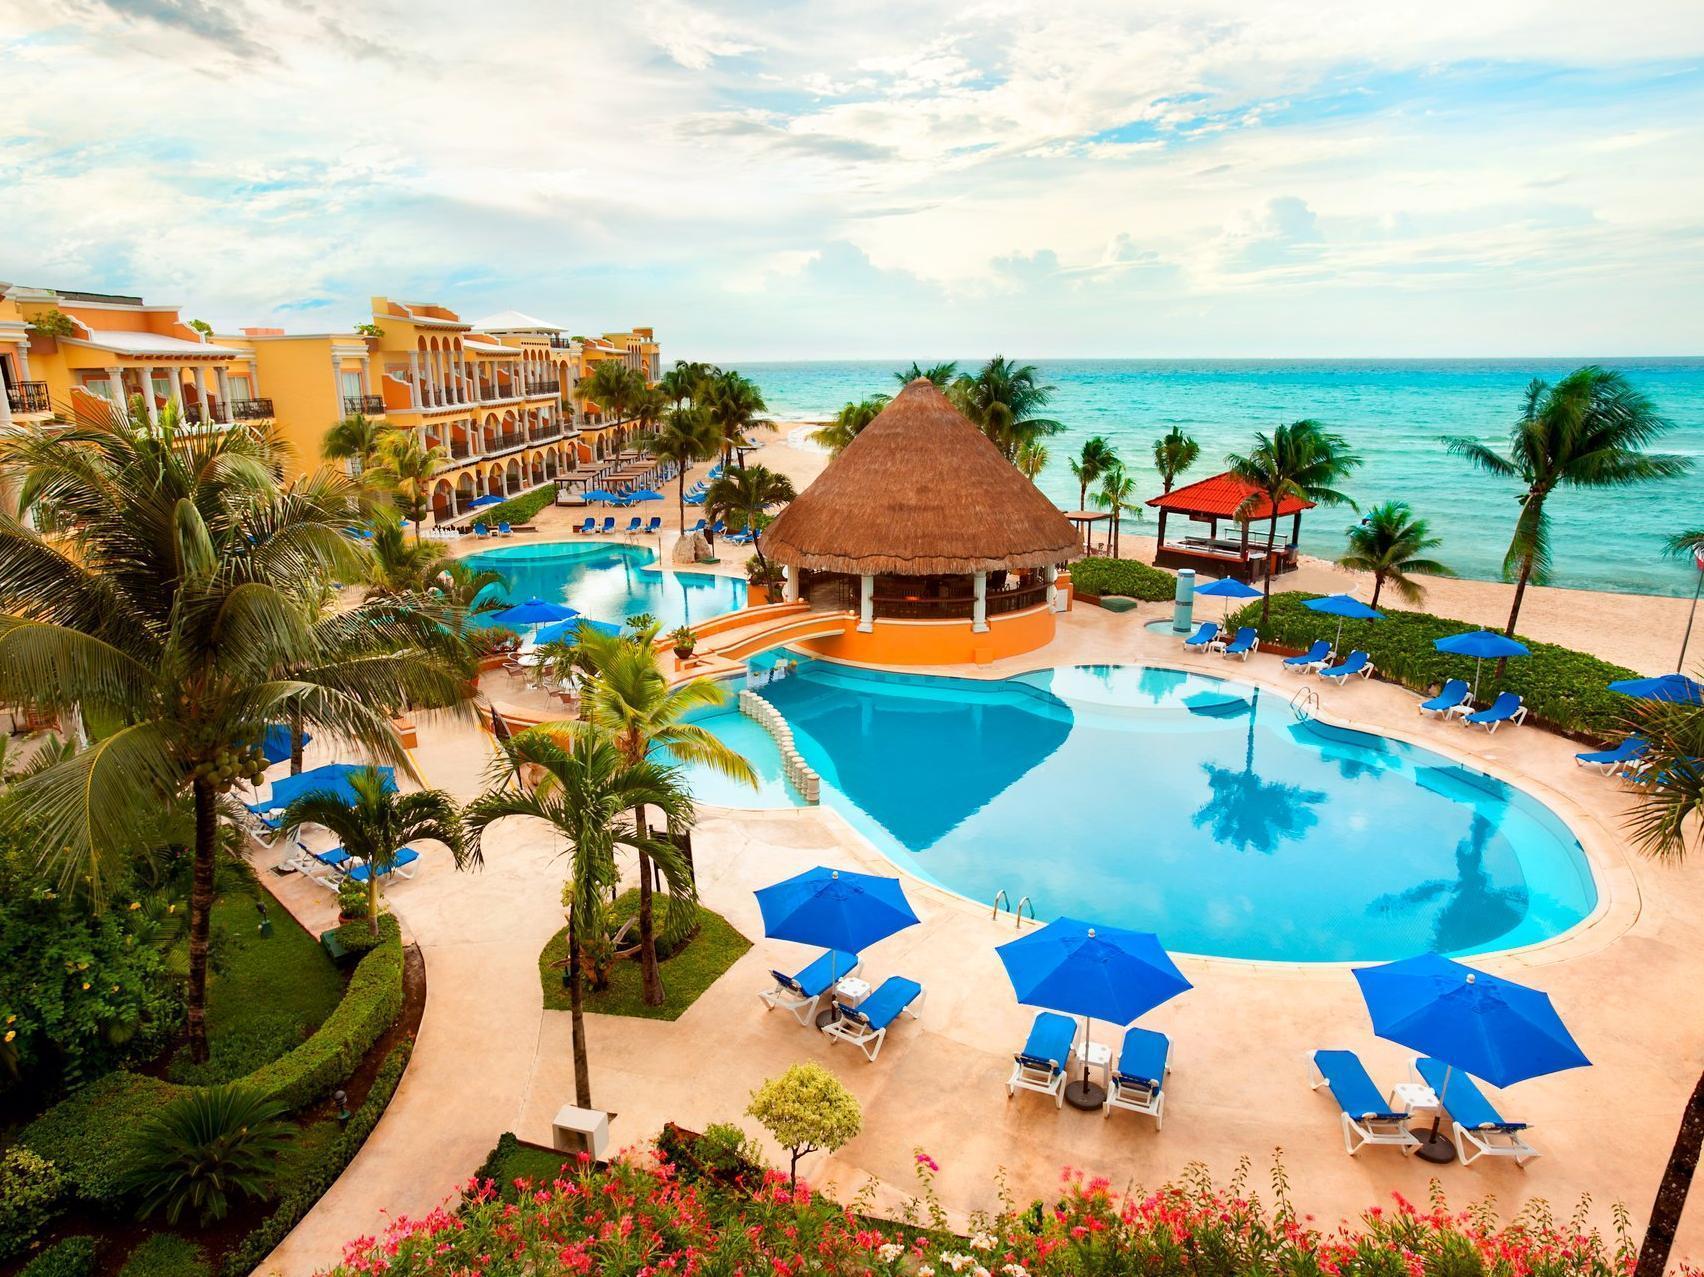 Panama Jack Resorts Playa del Carmen All Inclusive